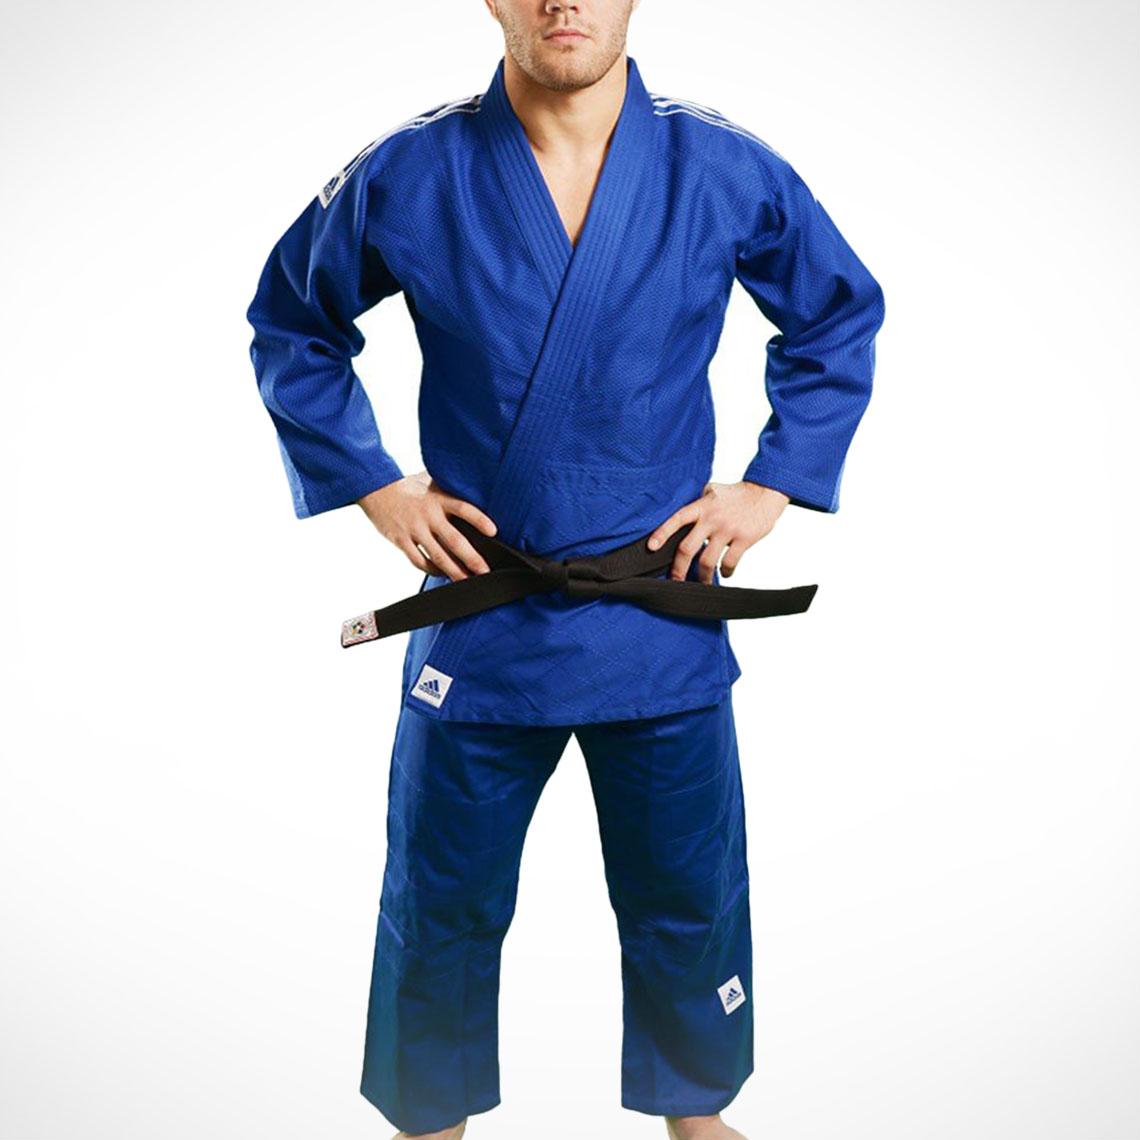 adidas J990 Millenium Judo uniform with stripes BlueWhite